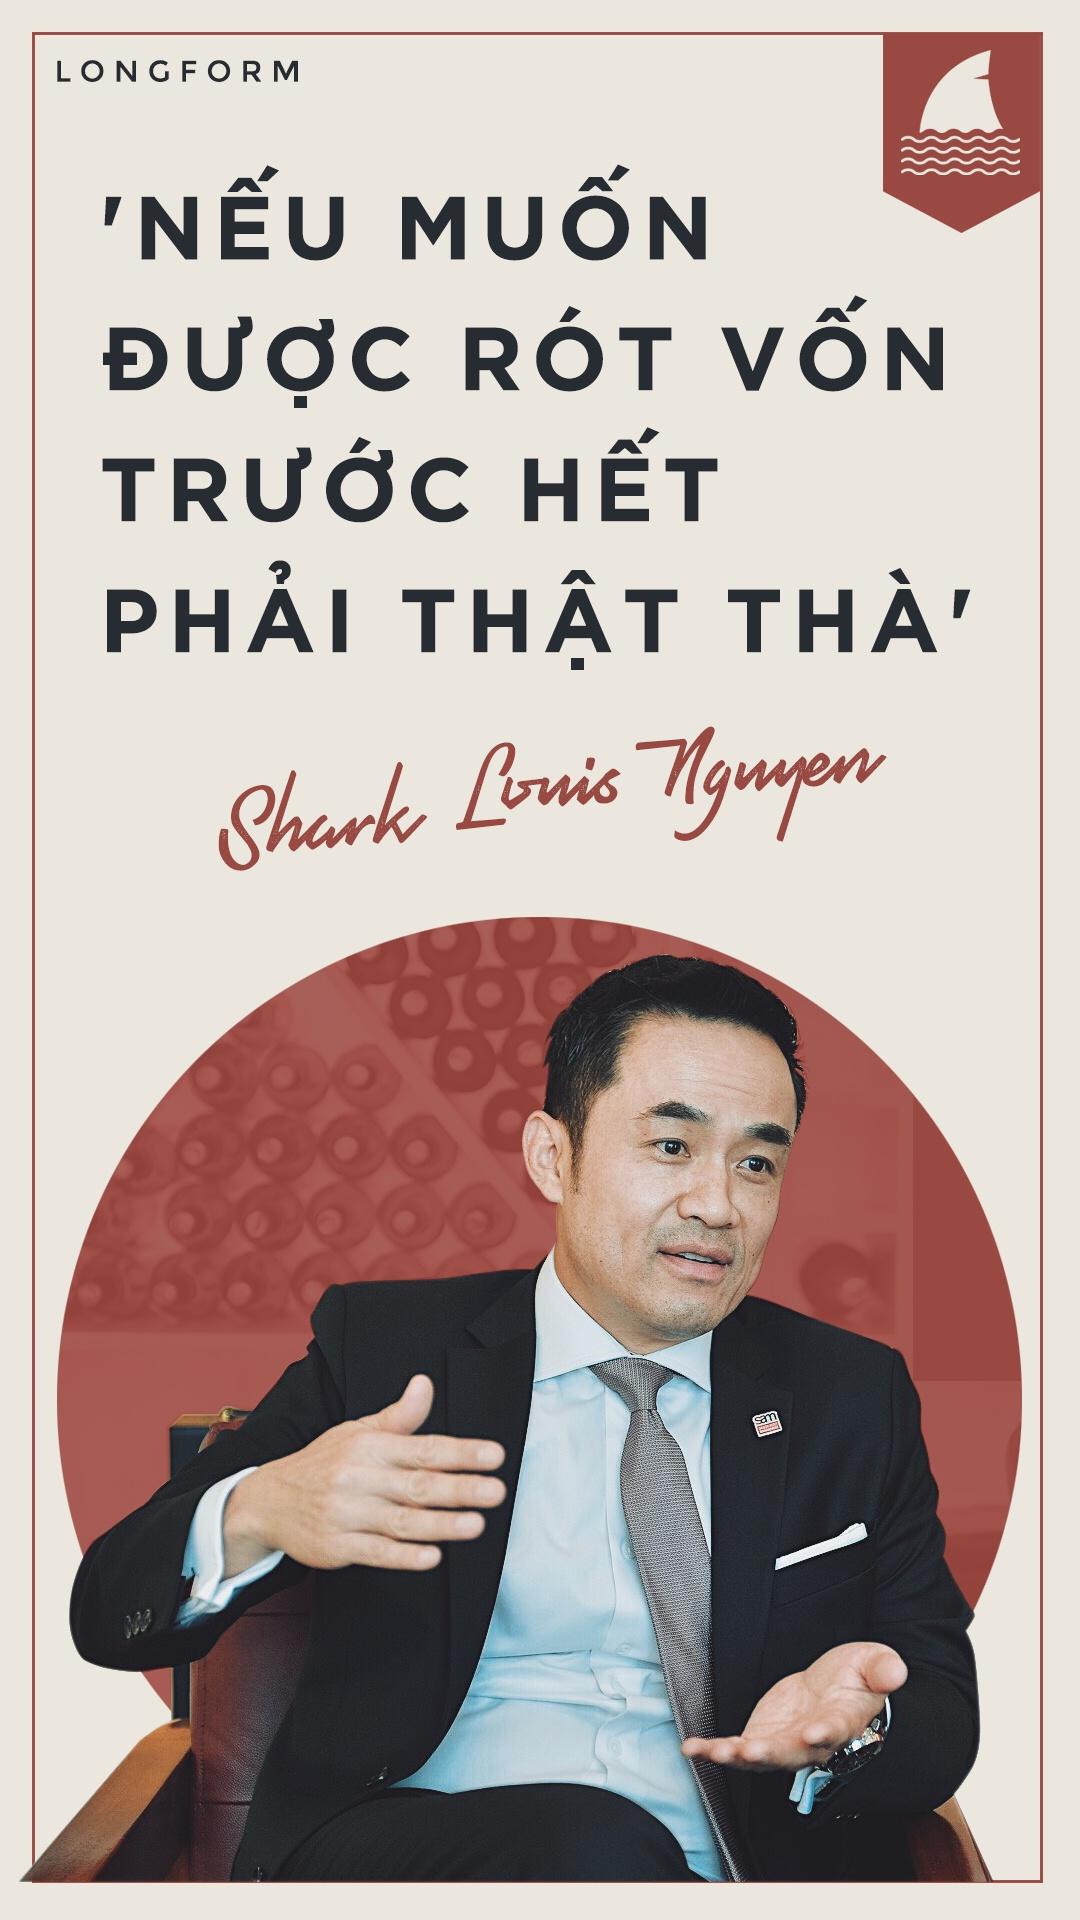 Shark Louis Nguyen: O Viet Nam, nhieu ban tre hung len la khoi nghiep hinh anh 1